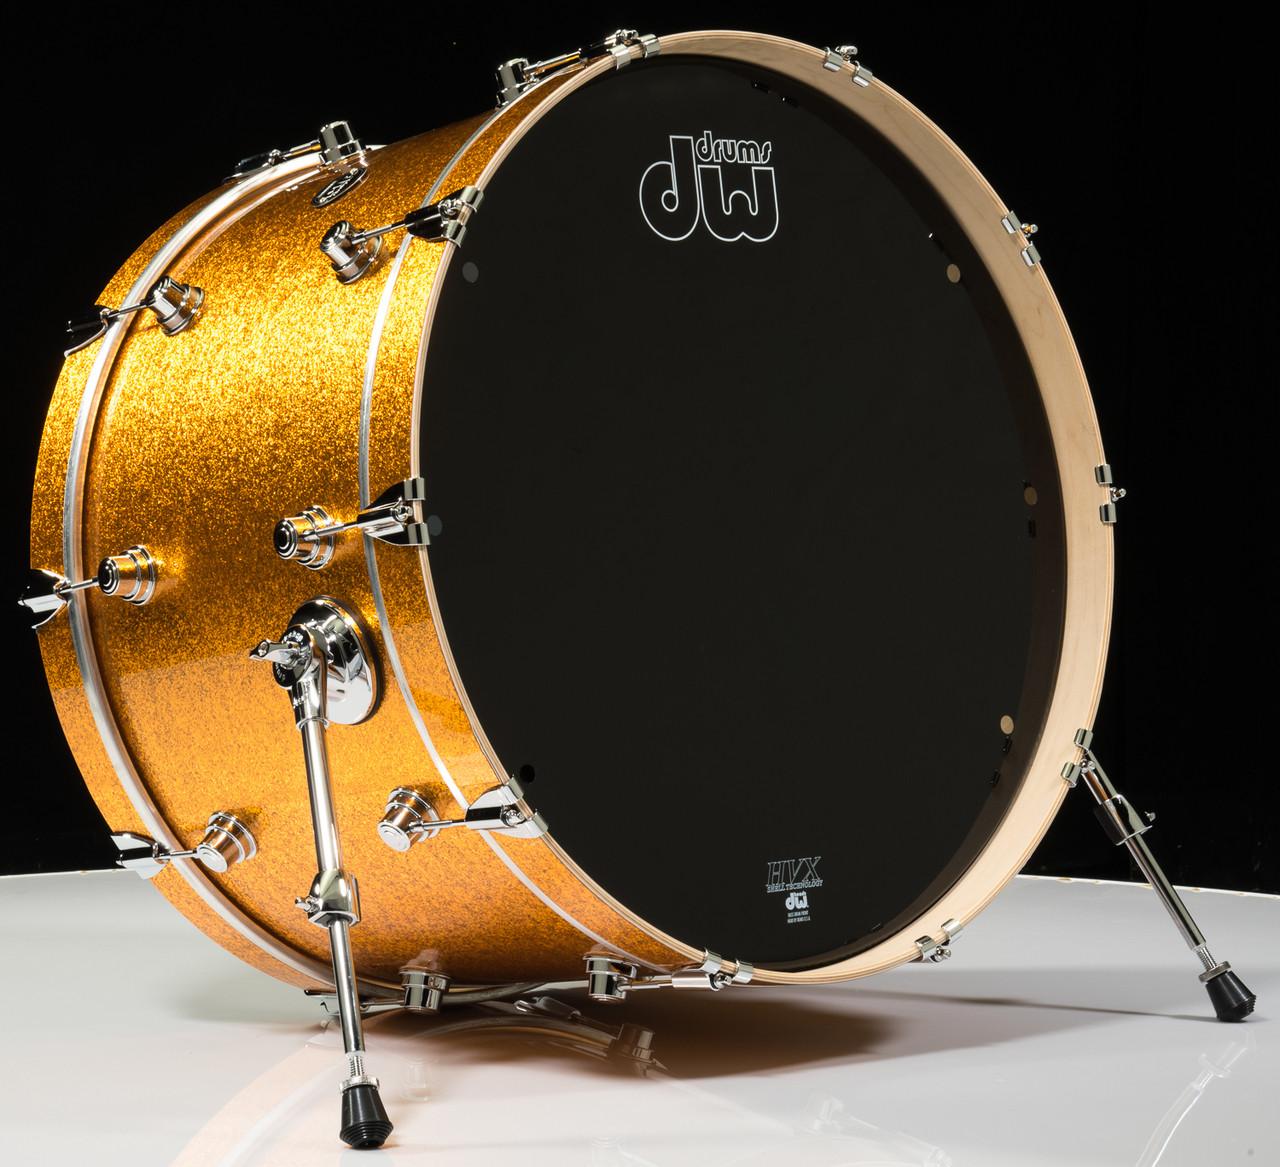 dw performance series 14x24 bass drum gold sparkle. Black Bedroom Furniture Sets. Home Design Ideas